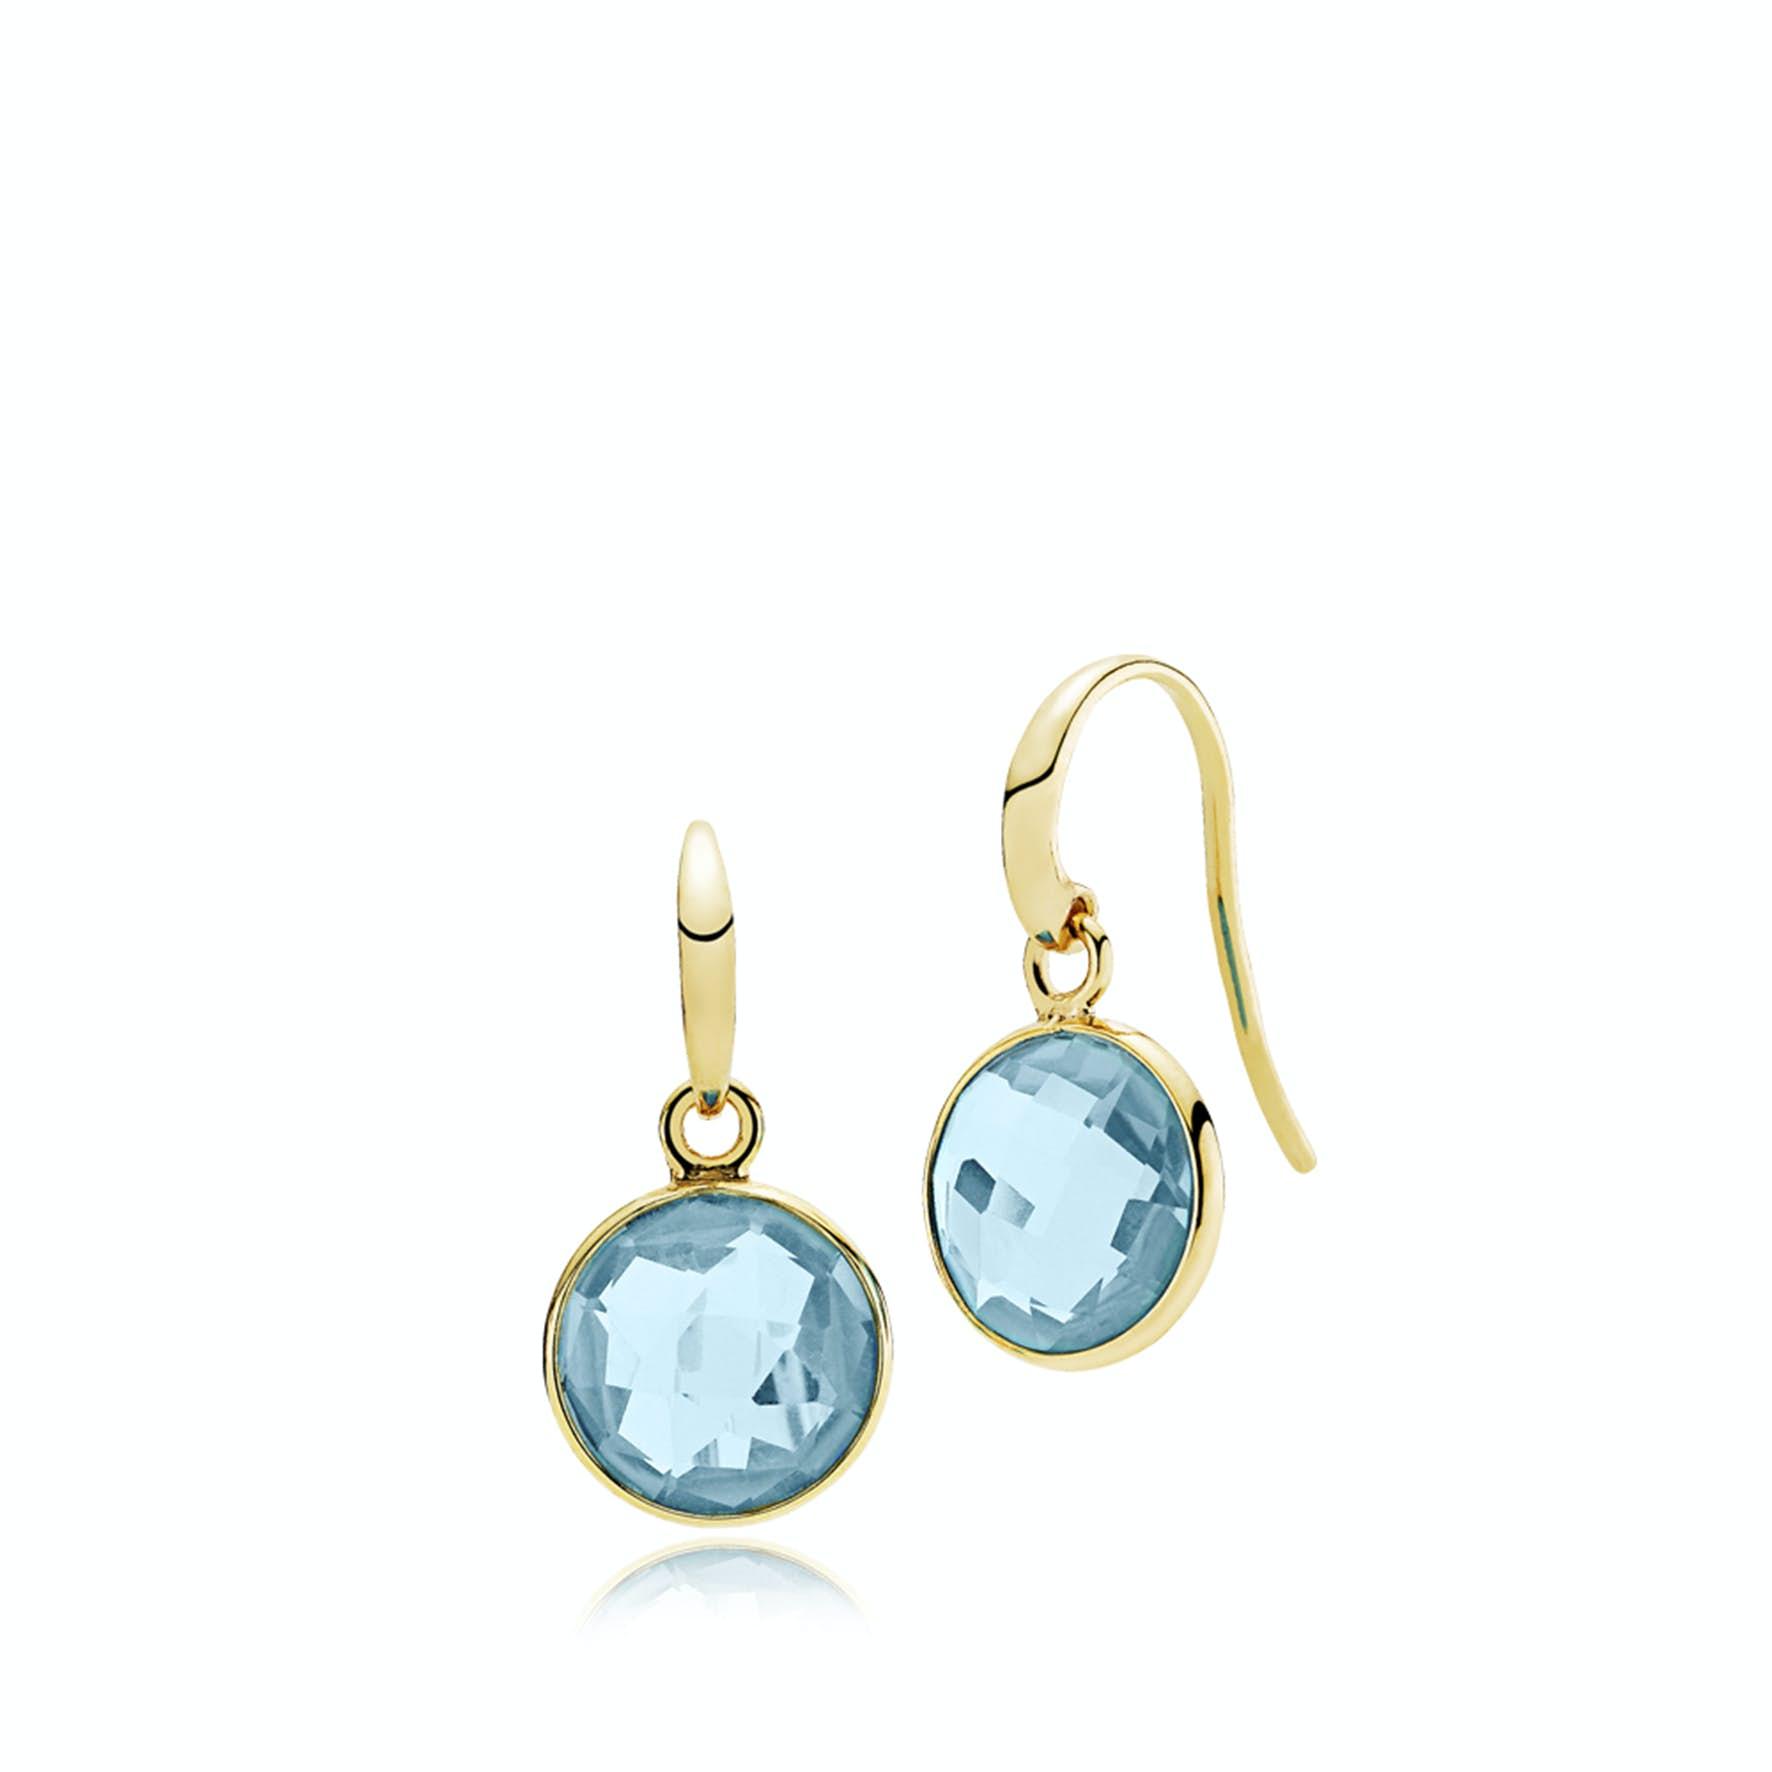 Prima Donna Earrings Aqua Blue from Izabel Camille in Goldplated-Silver Sterling 925 Aqua Blue